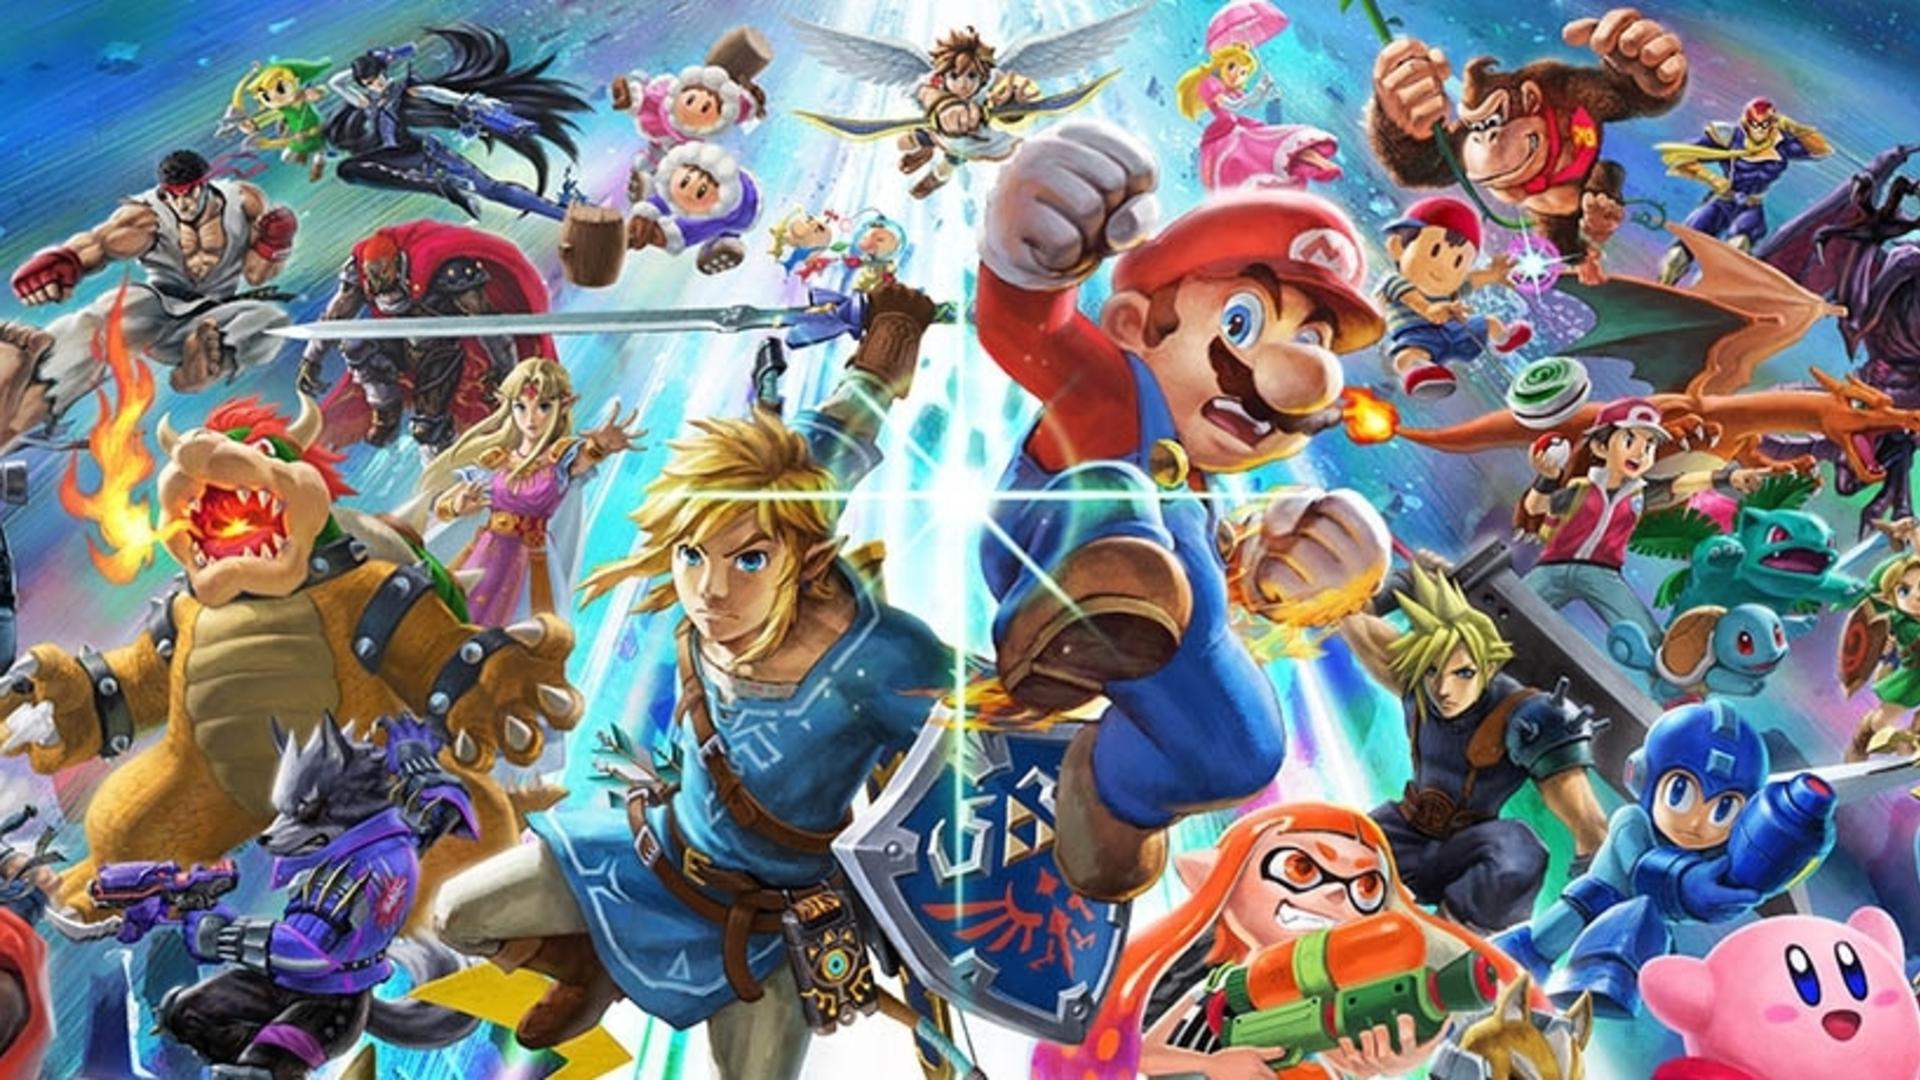 6. Super Smash Bros. Ultimate